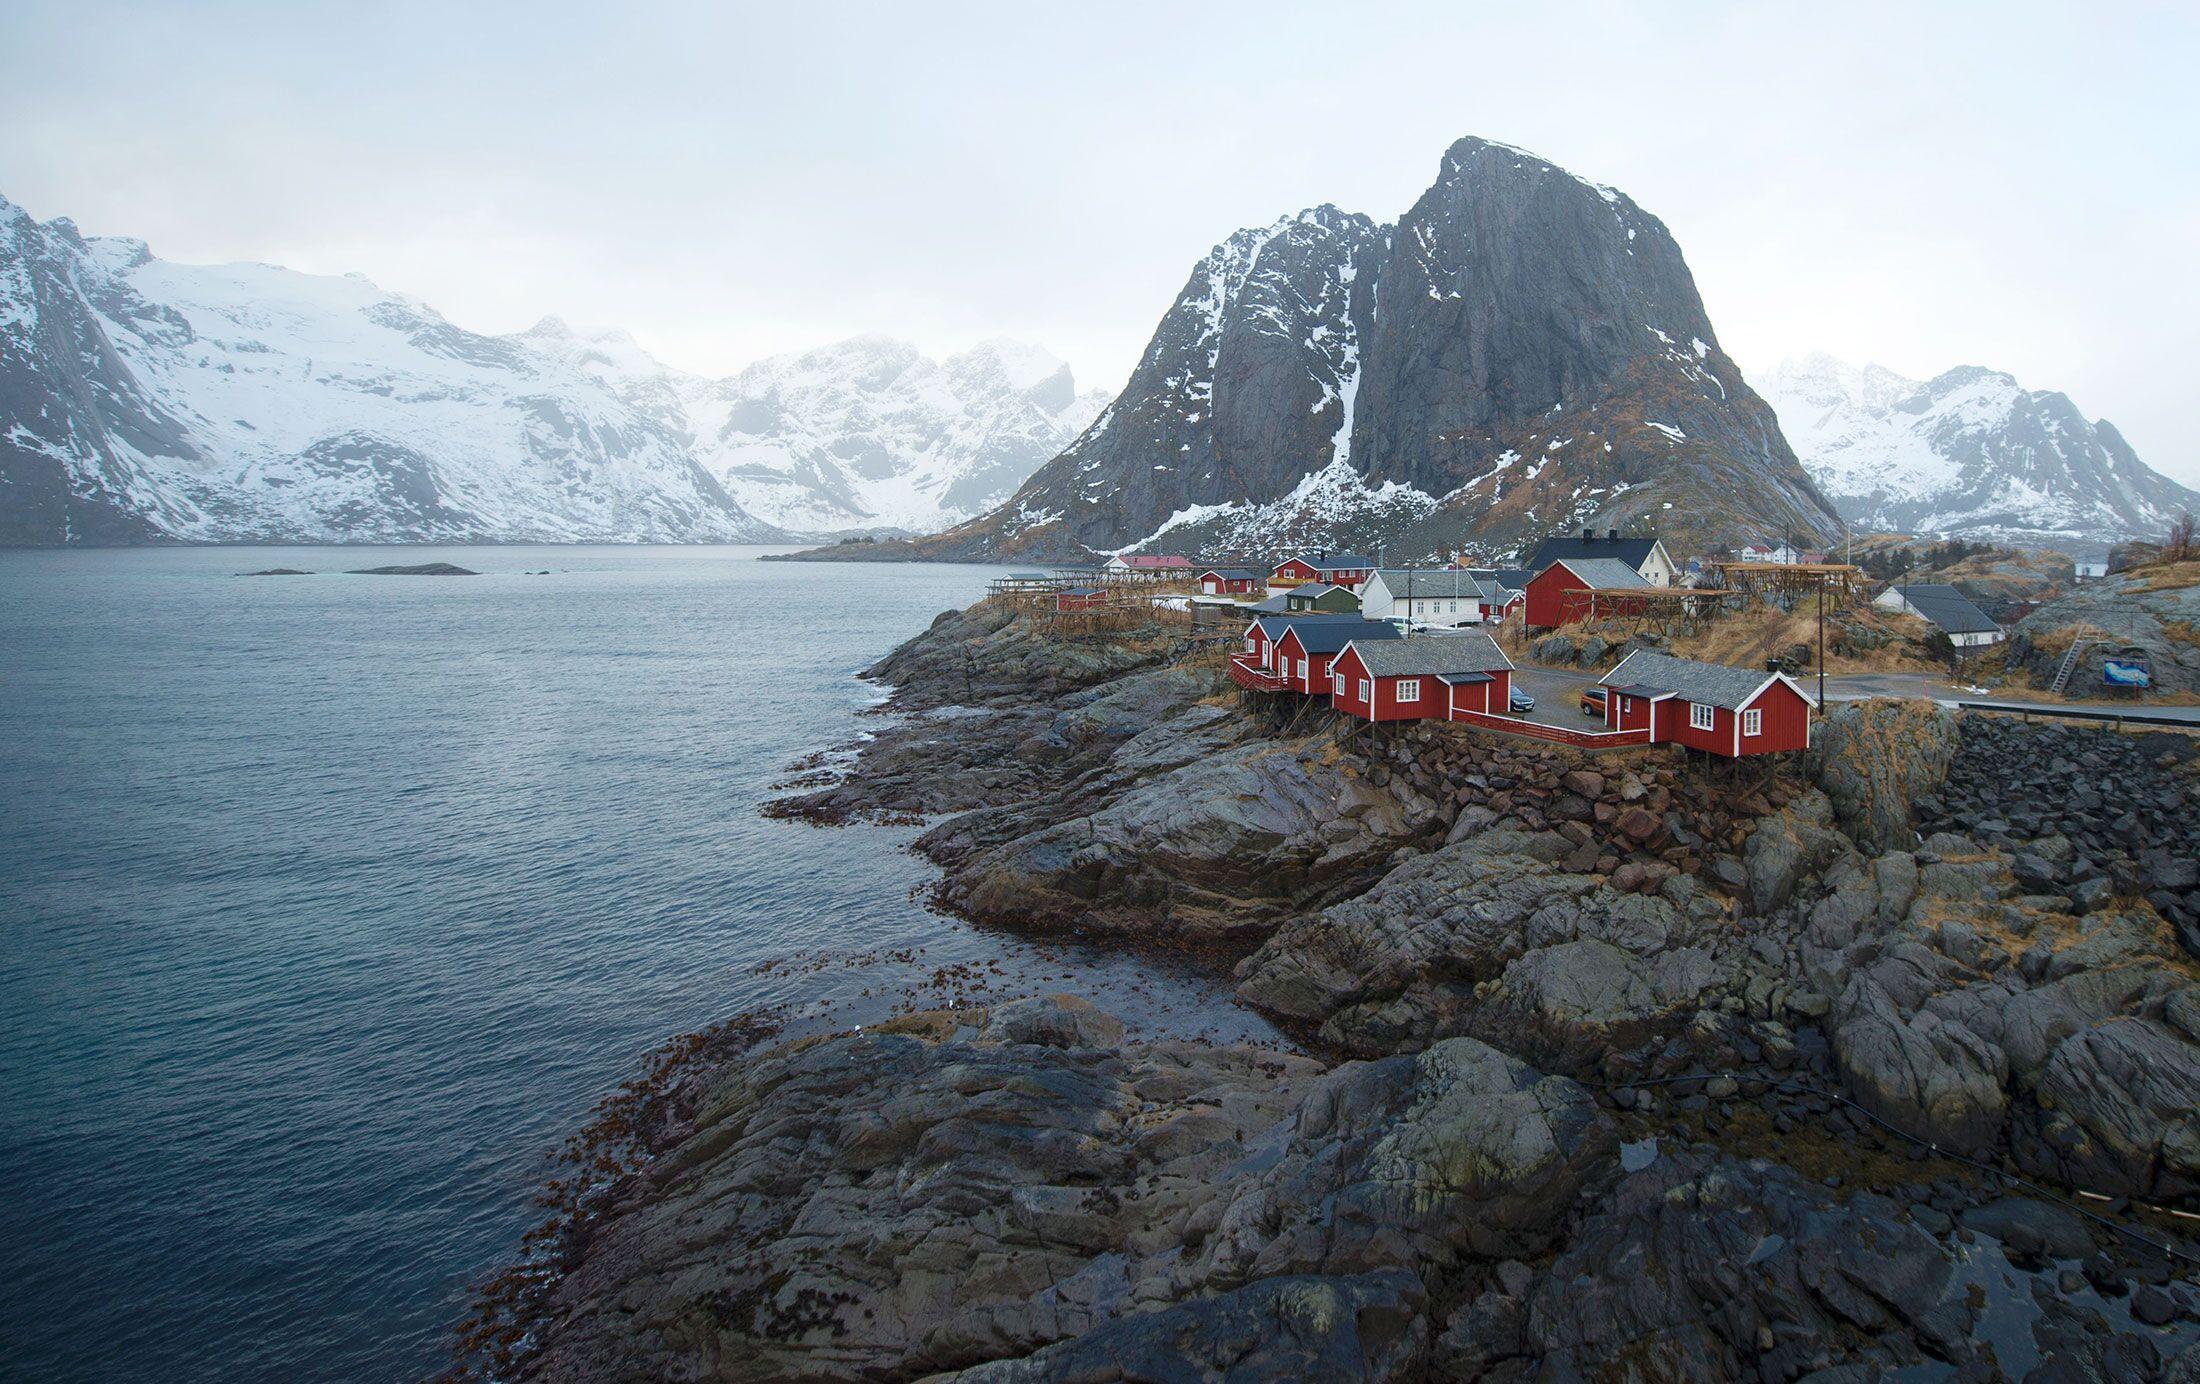 Big Oil's Dream of $65 Billion Hidden Off Norway Is Fading Away thumbnail